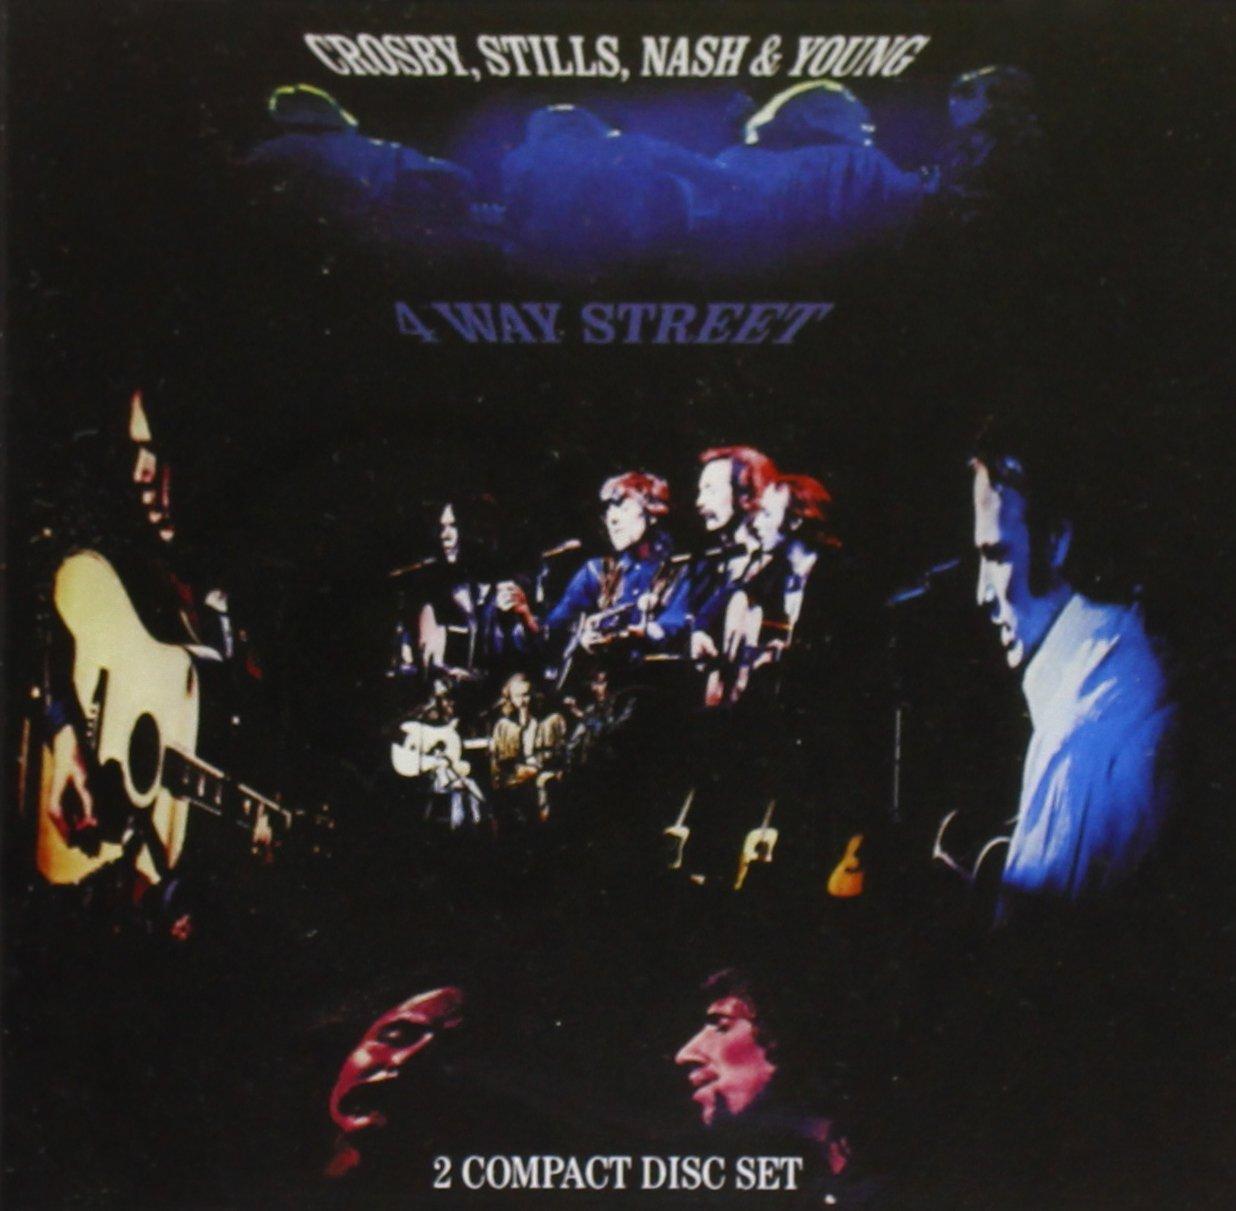 4 Way Street by CROSBY STILLS NASH & YOUNG